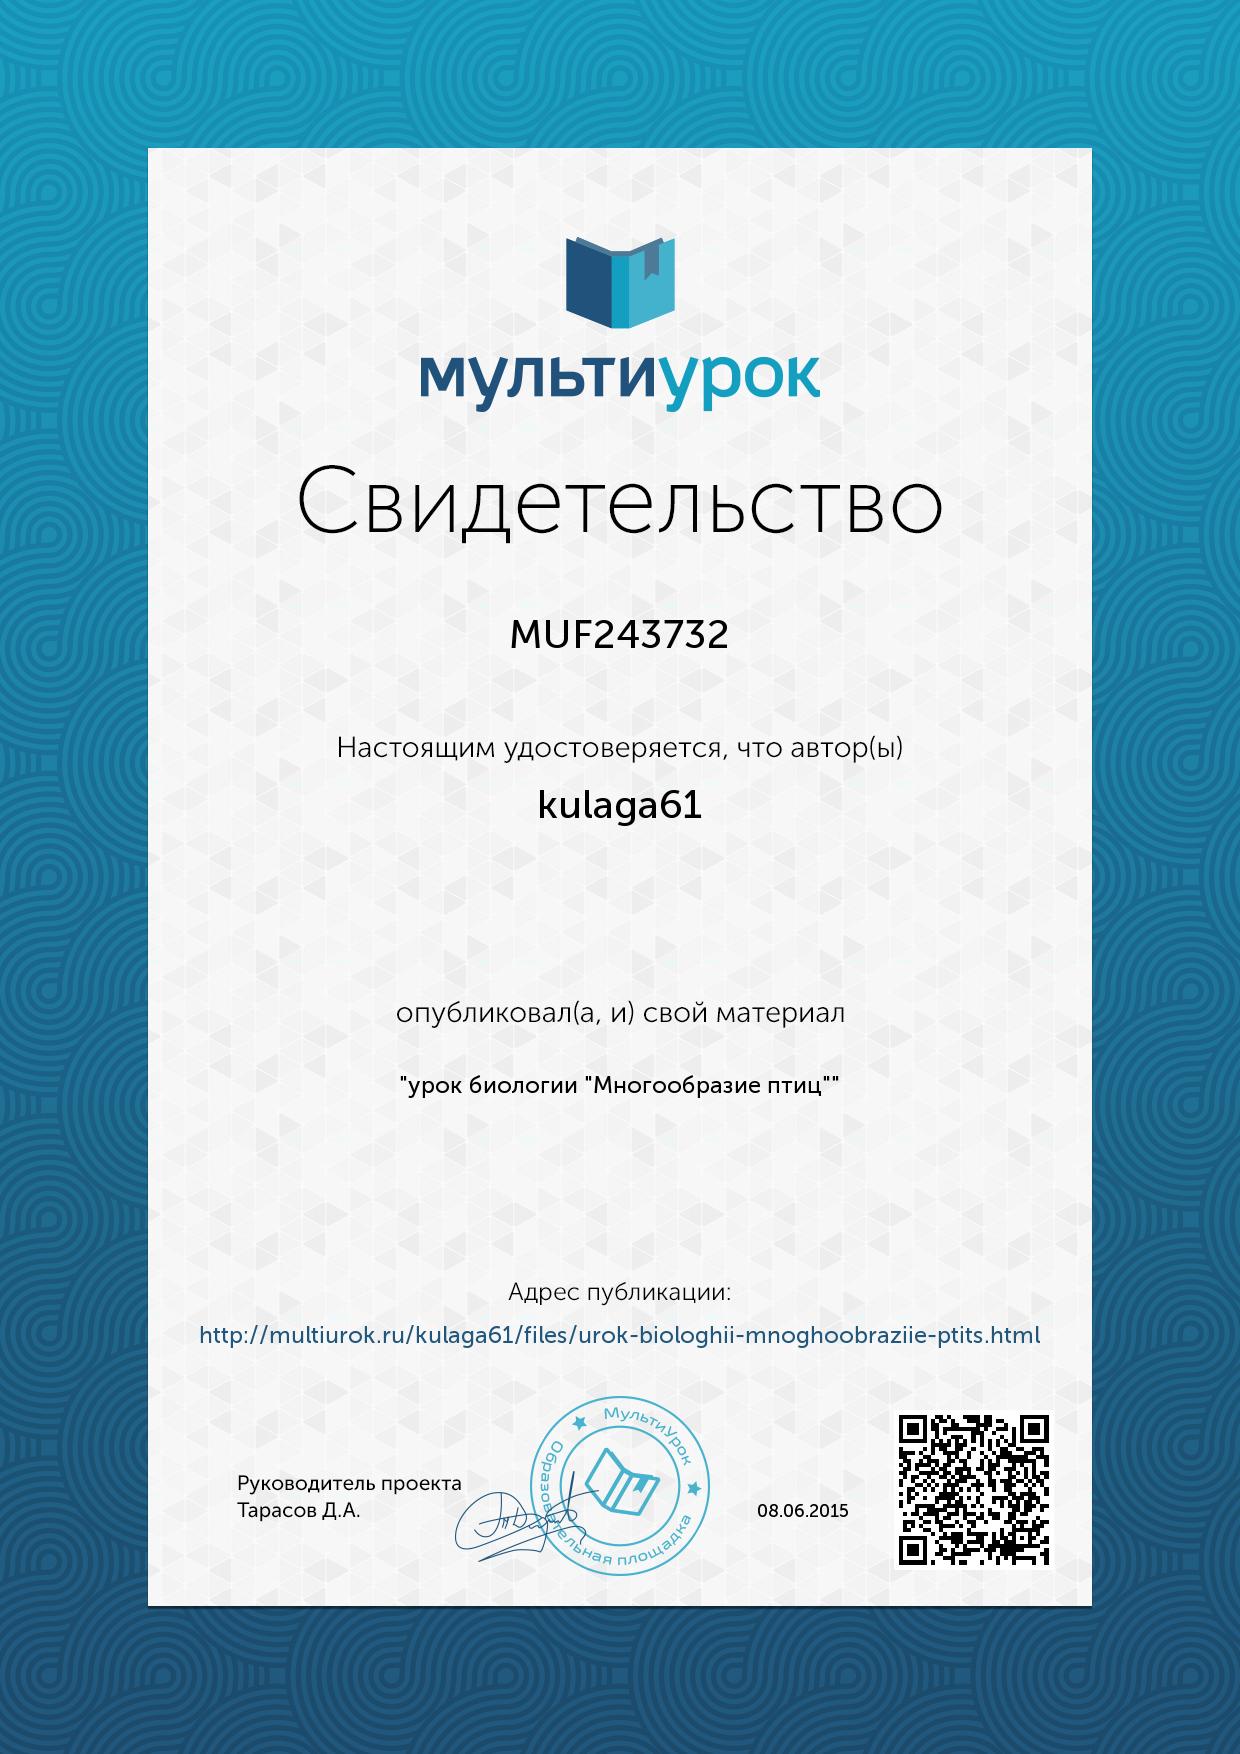 hello_html_mf72c6fc.png